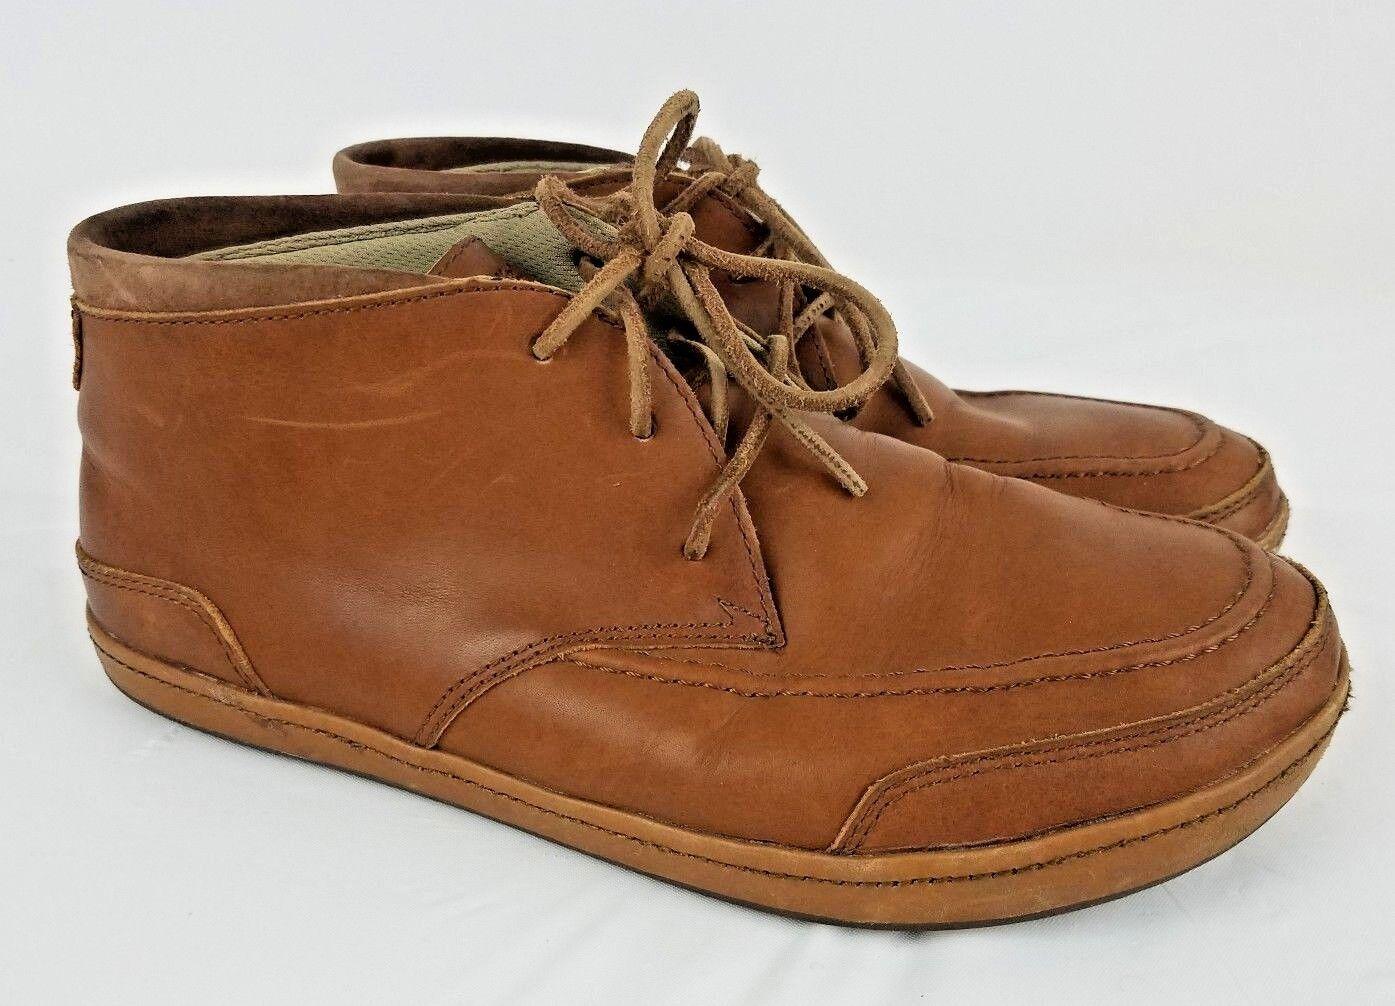 Olu Kai SKFD Pala Brown Soft Leather Chukka Ankle Boots Size 10